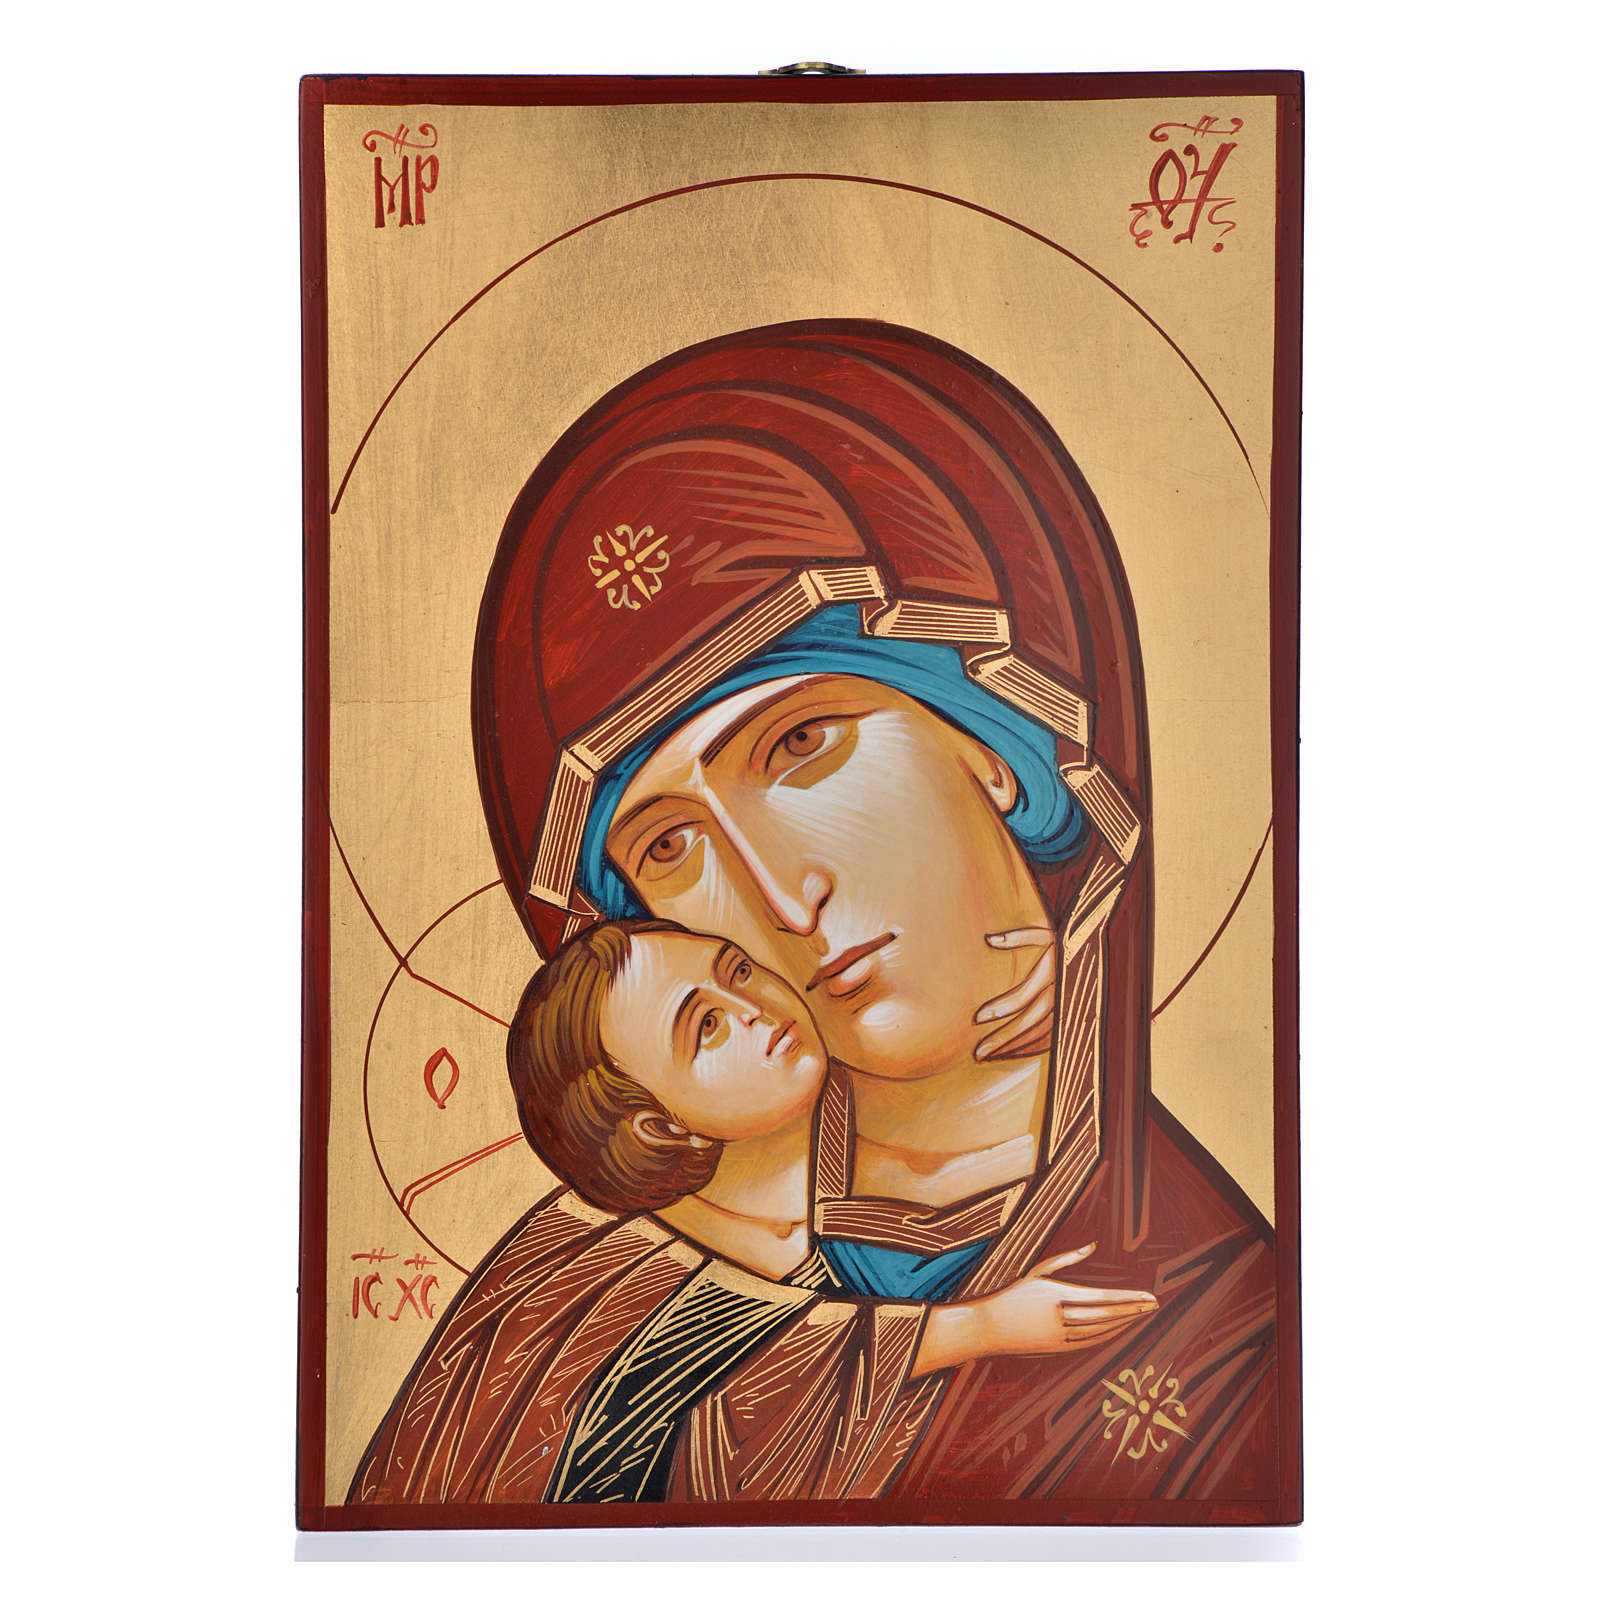 Icona Vergine di Vladimir serie limitata e numerata nr. 92 4